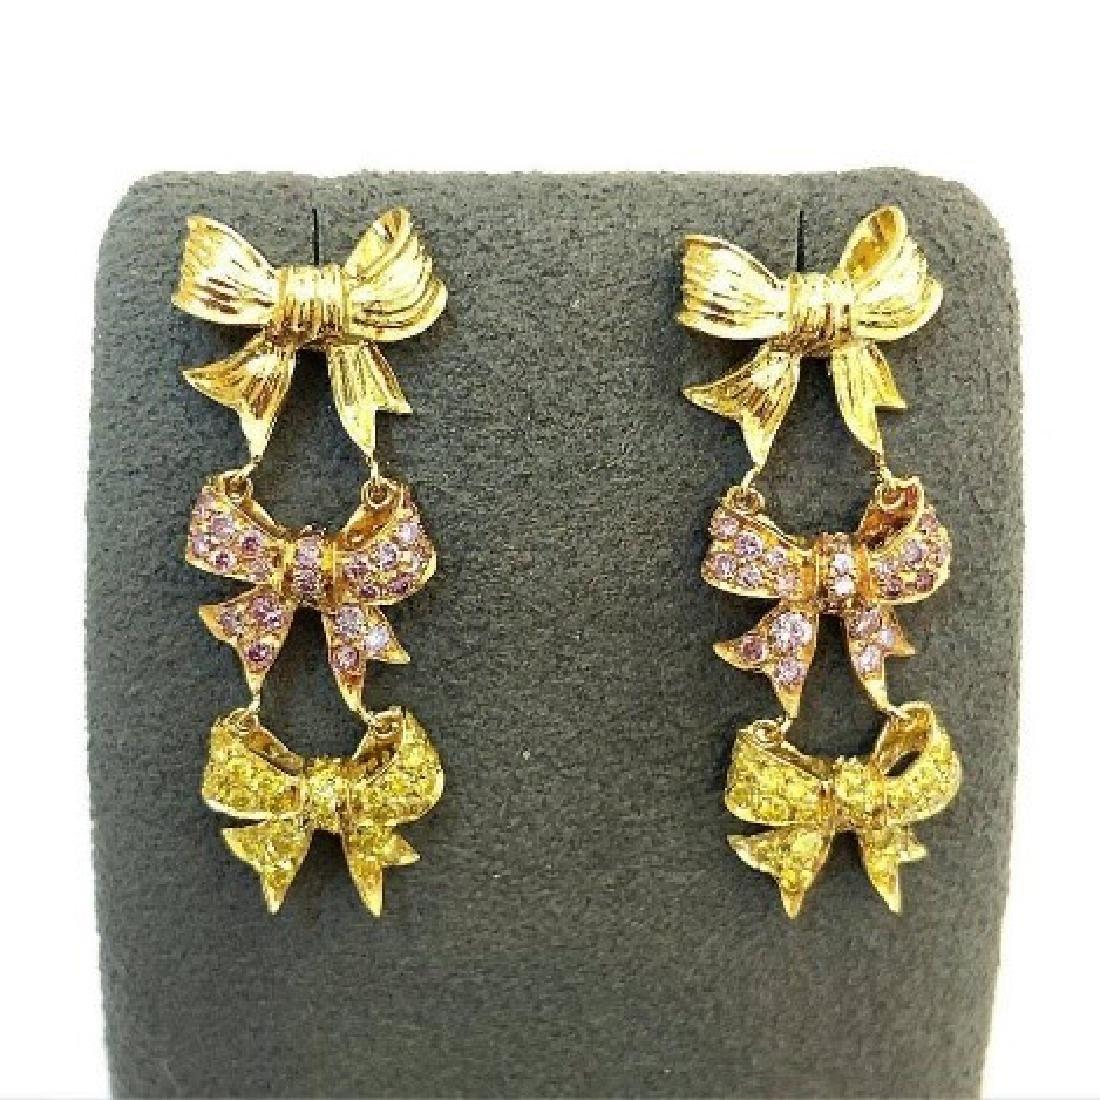 Carvin French Fancy Yellow & Pink Diamond Earrings